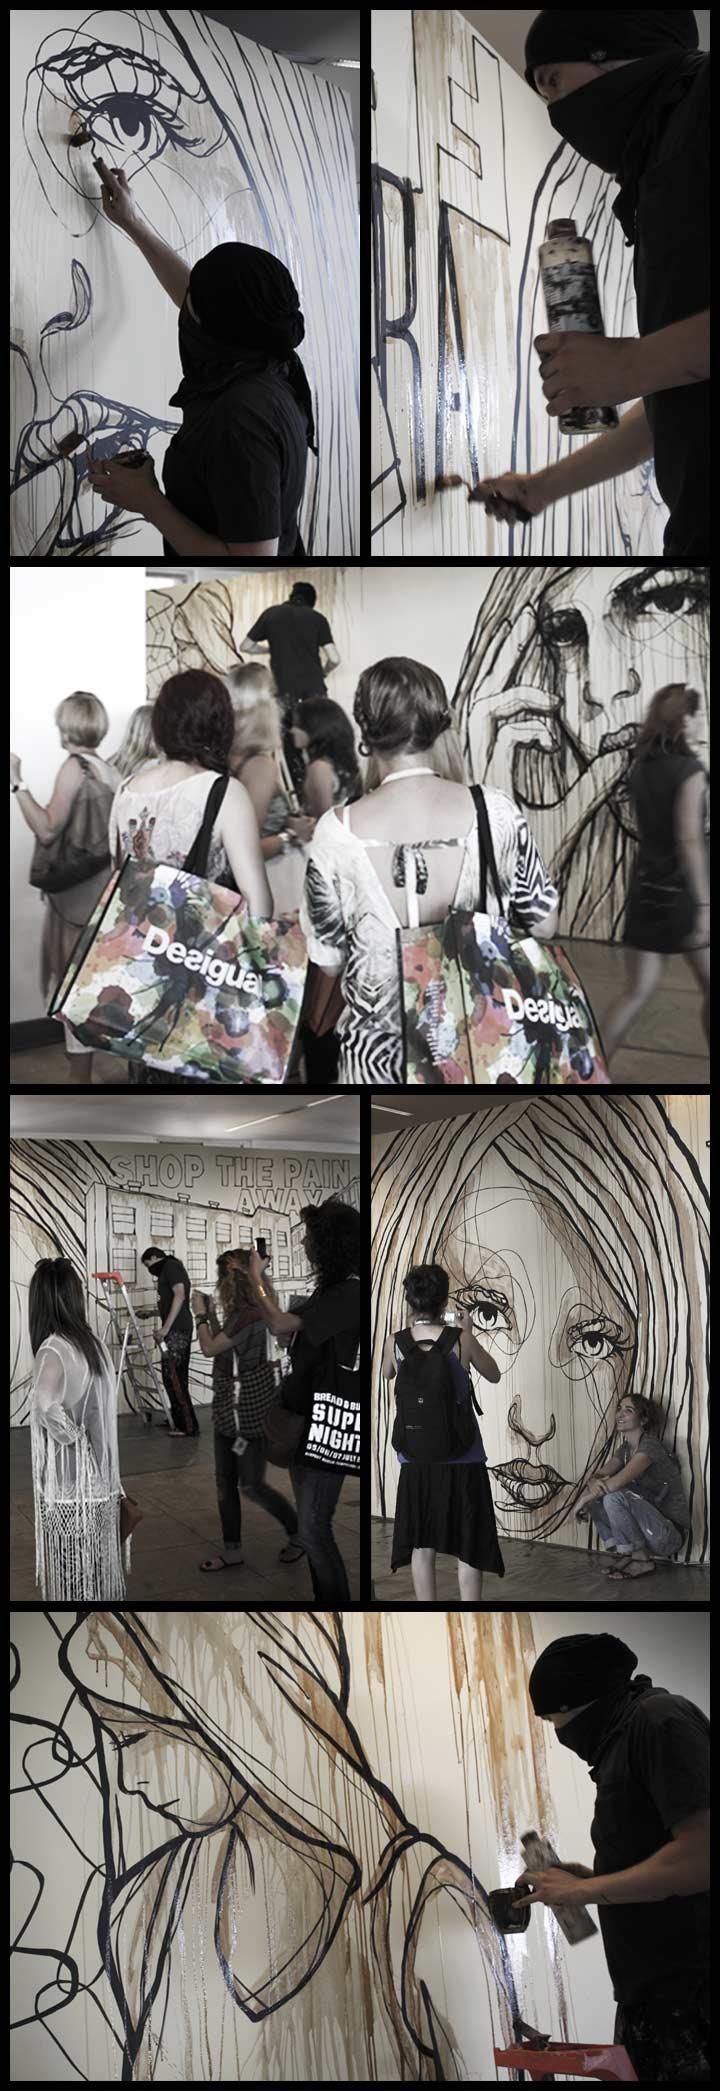 streetart-berlin-el-bocho-20